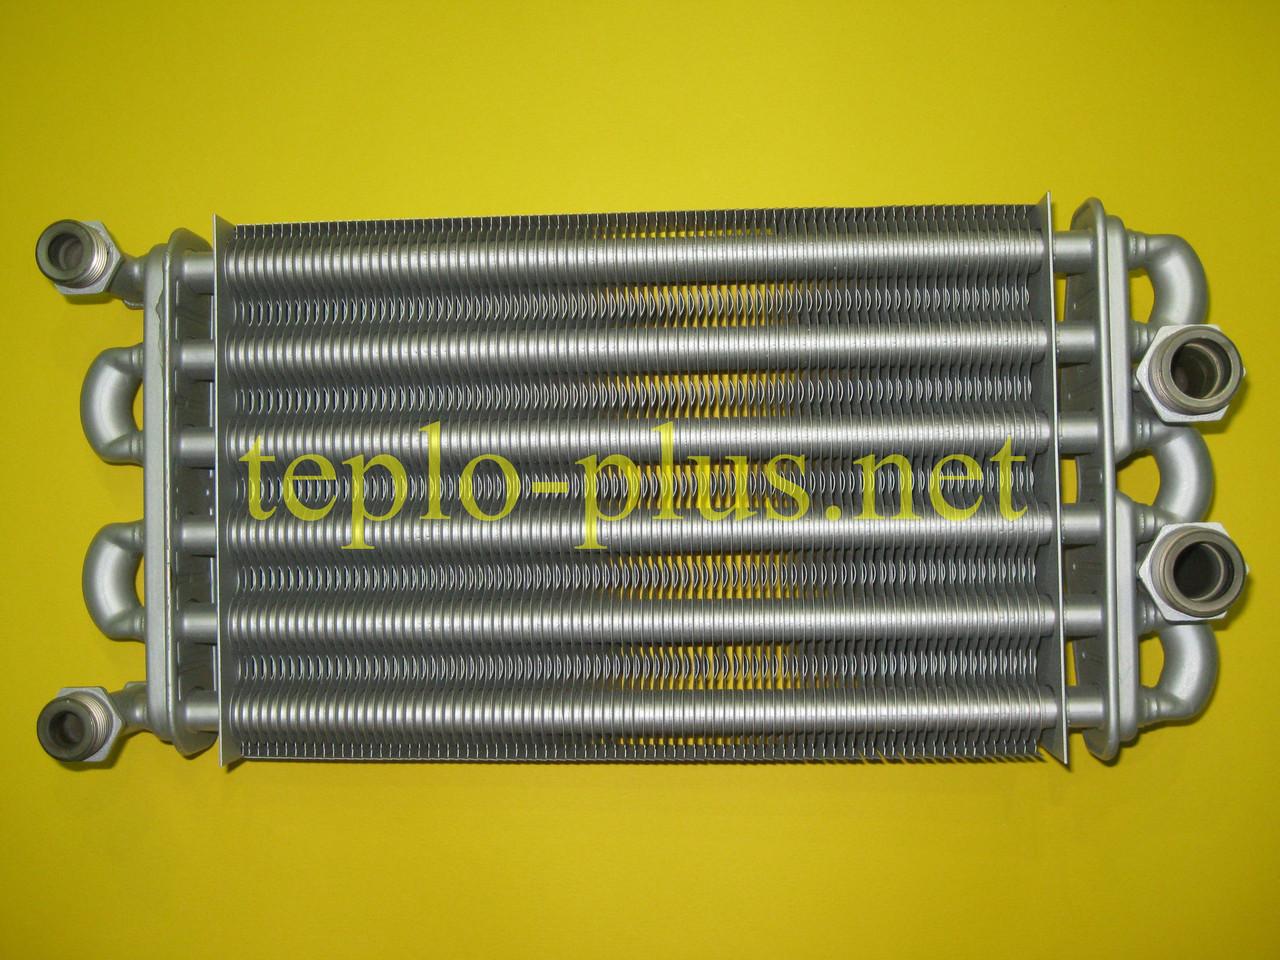 Теплообменник битермический 998619 Ariston TX 23/27 MFFI/MI, Т2 23/27 MFFI/MI